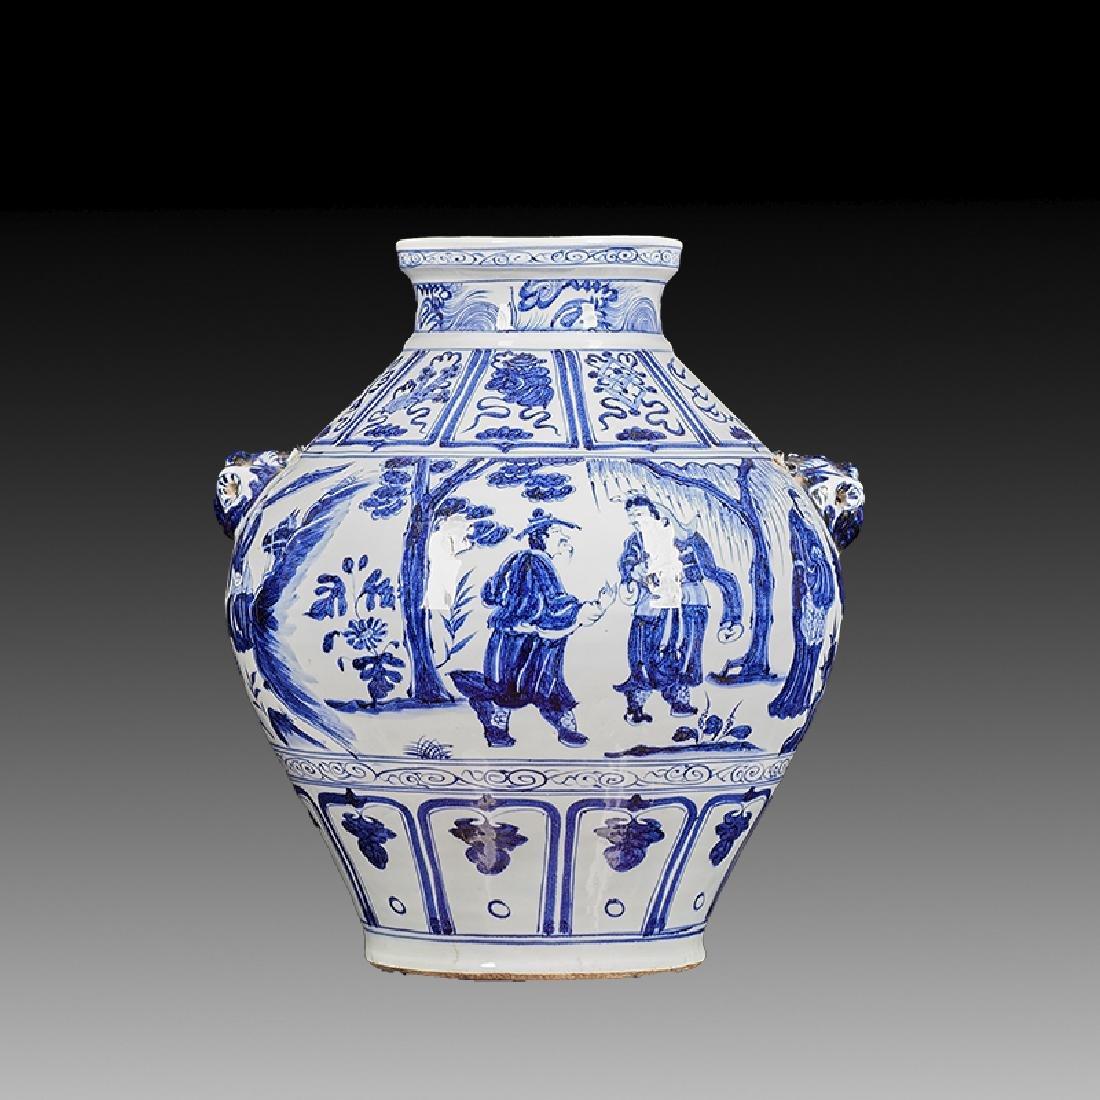 Chinese Blue And White Porcelain Vase